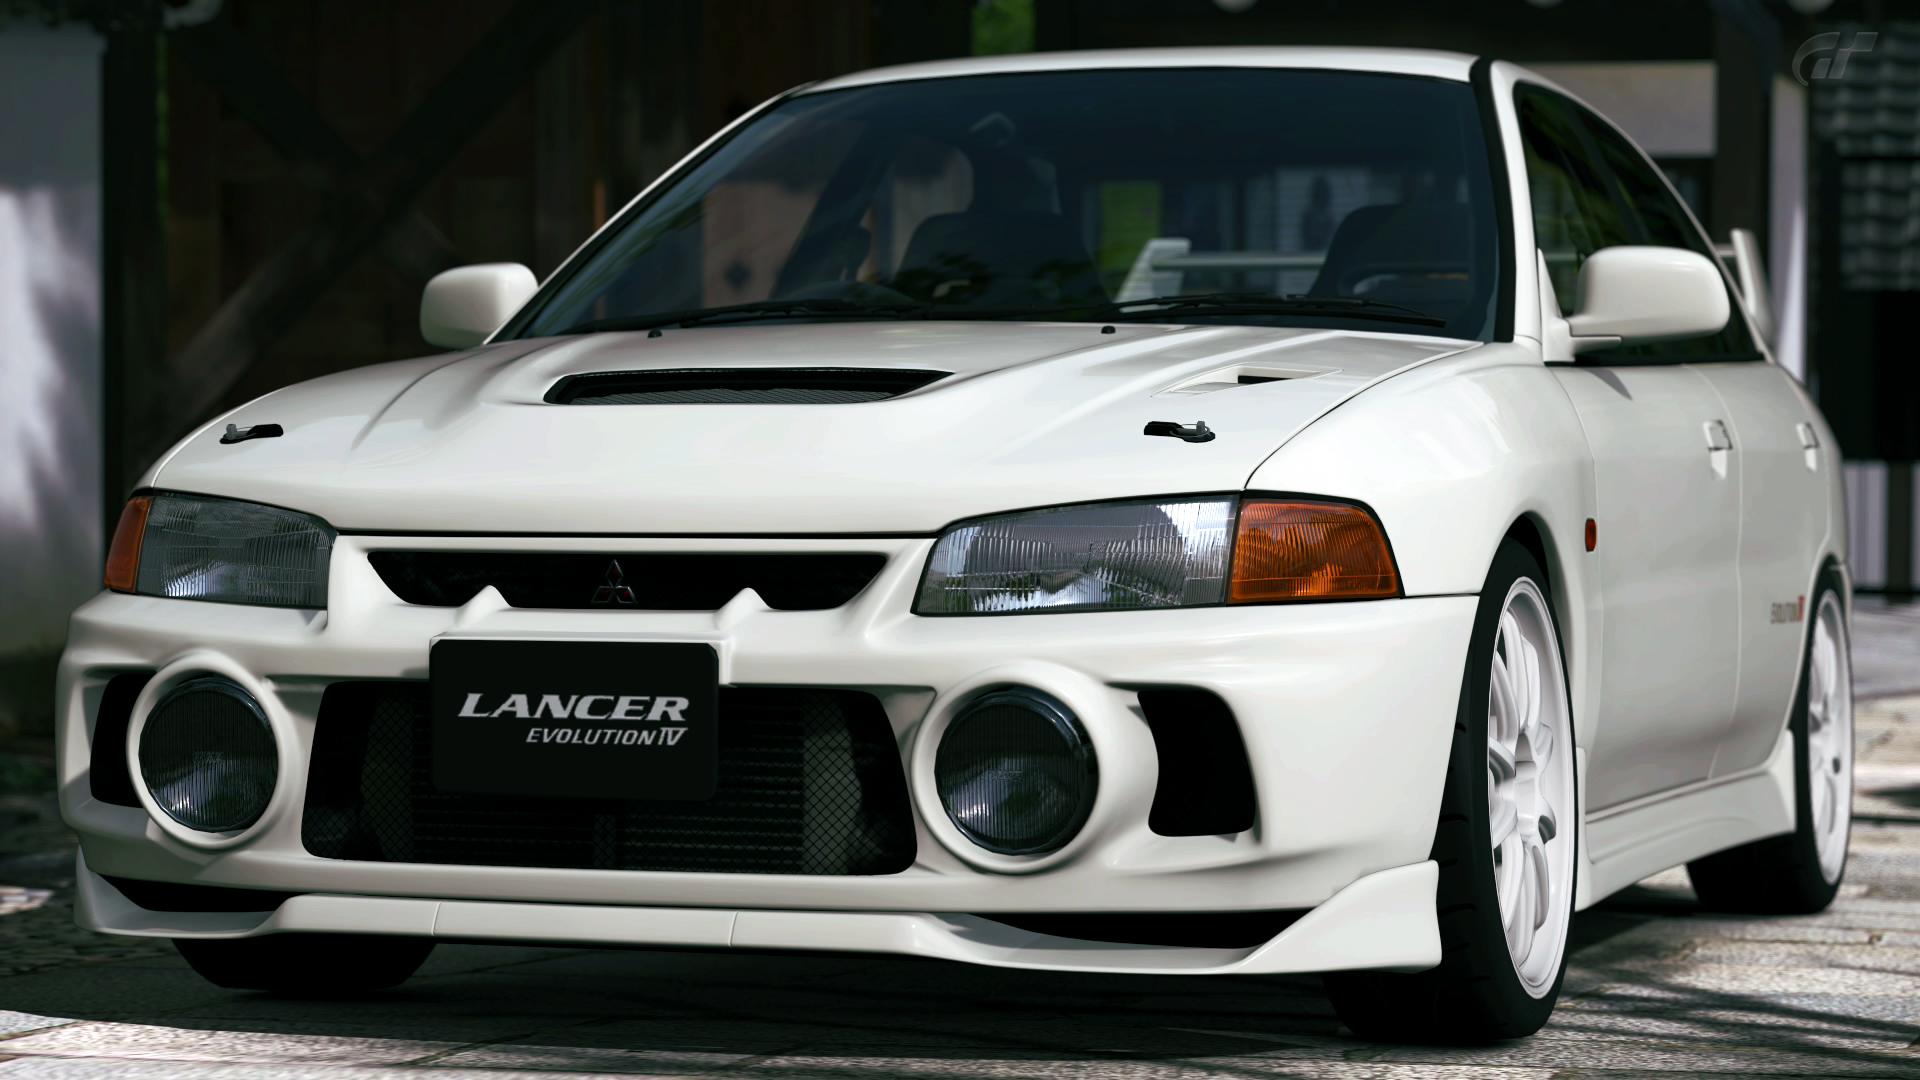 Mitsubishi Lancer Evolution IV 1996 - 1998 Sedan #5